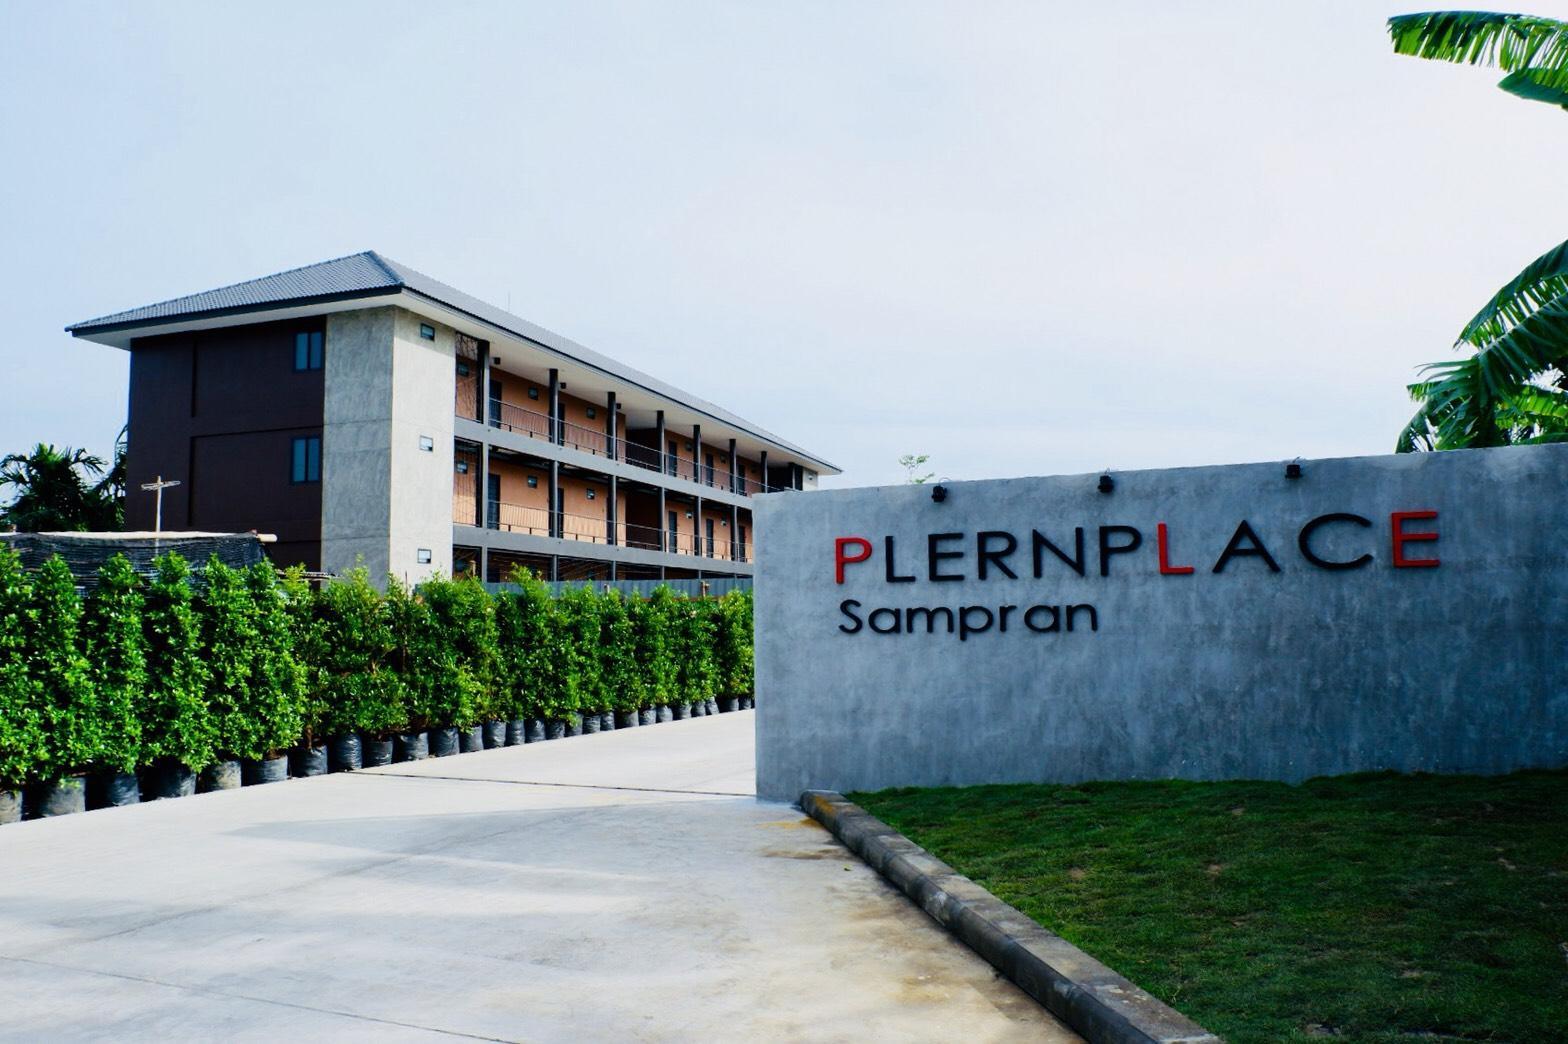 Plernplace, Sam Phran